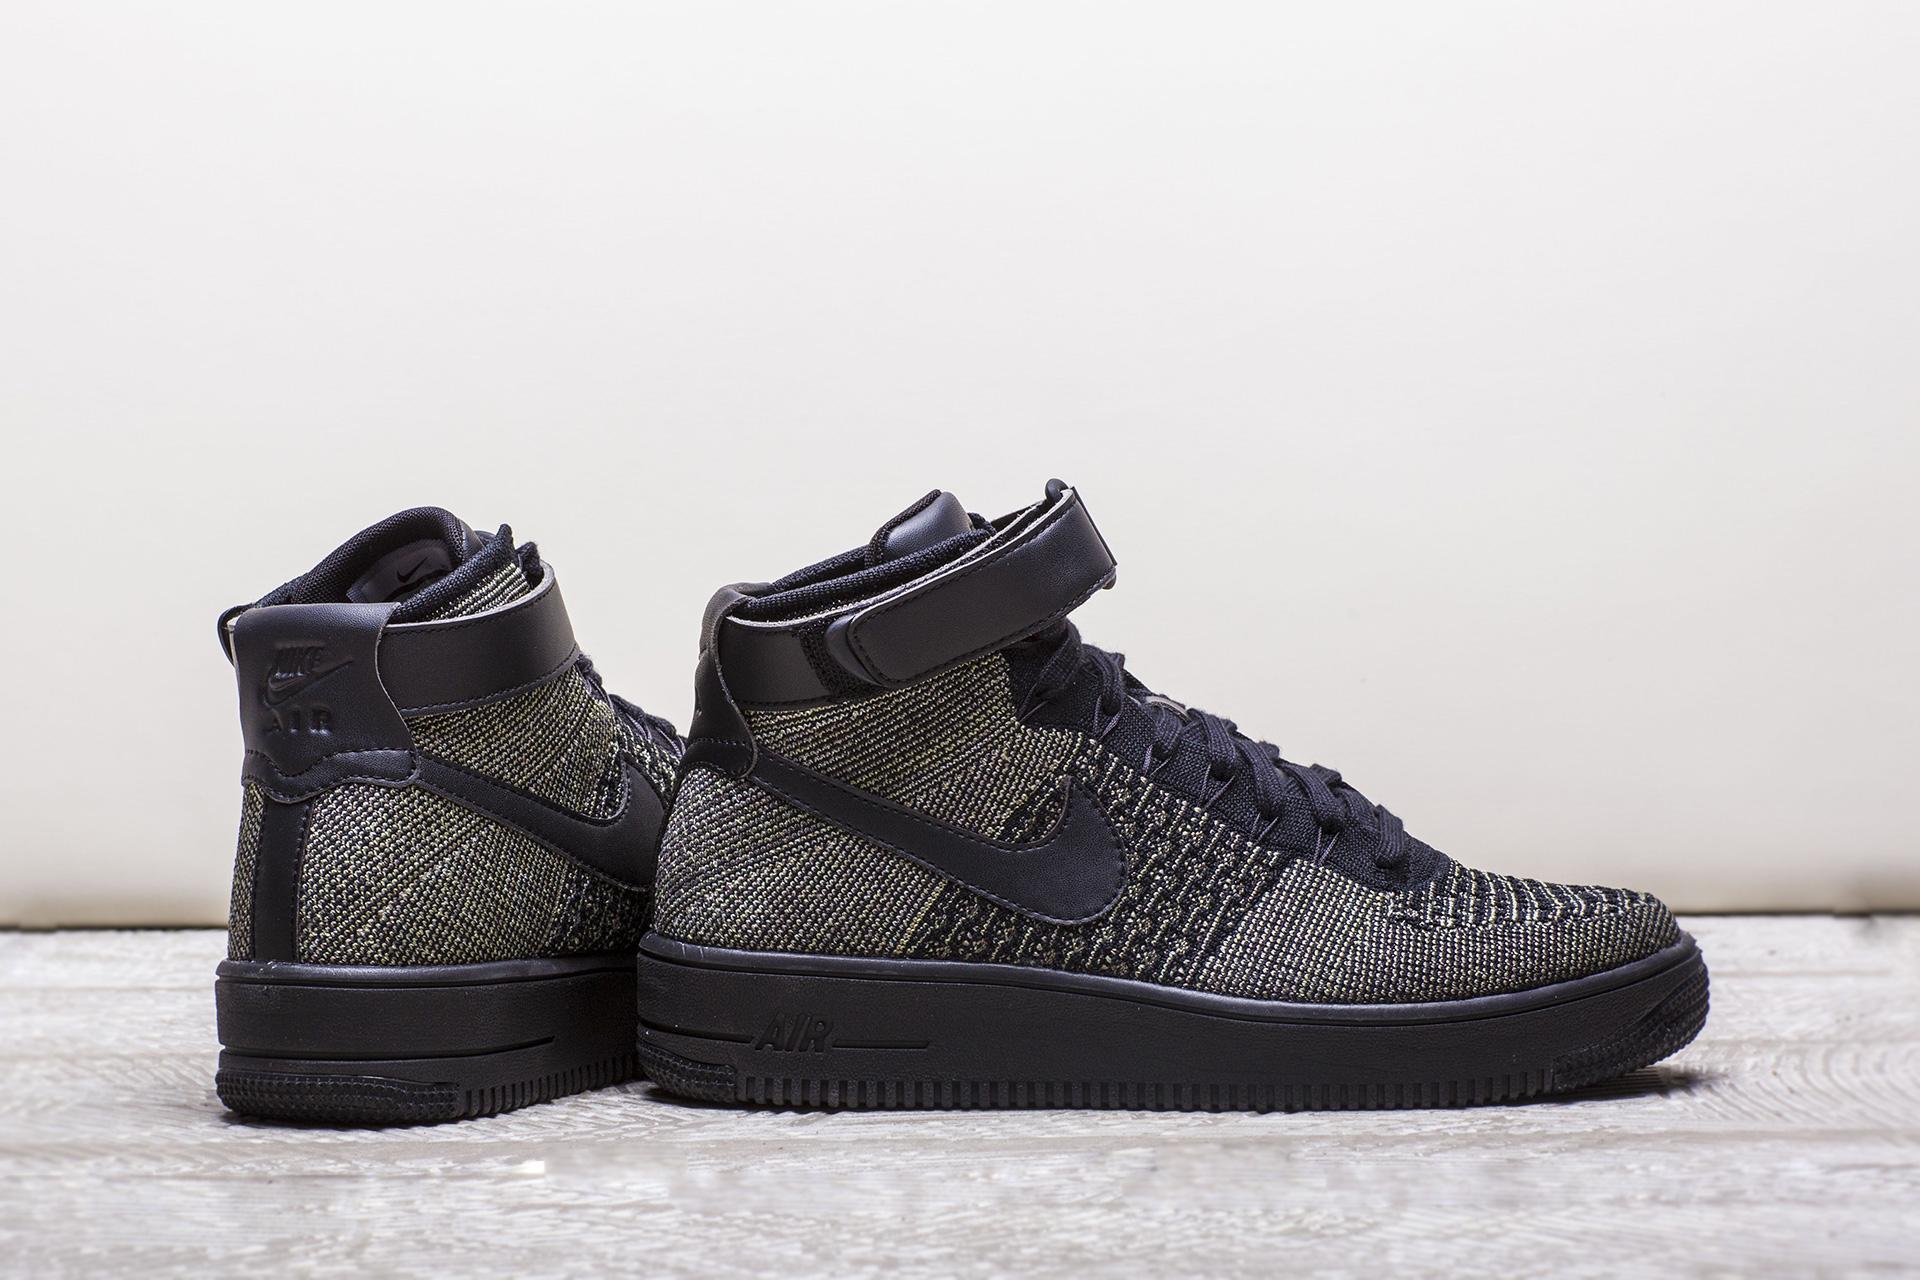 db0c74cd6d4254 ... Купить мужские чёрные кроссовки Nike Air Force 1 Ultra Flyknit Mid -  фото 2 картинки ...